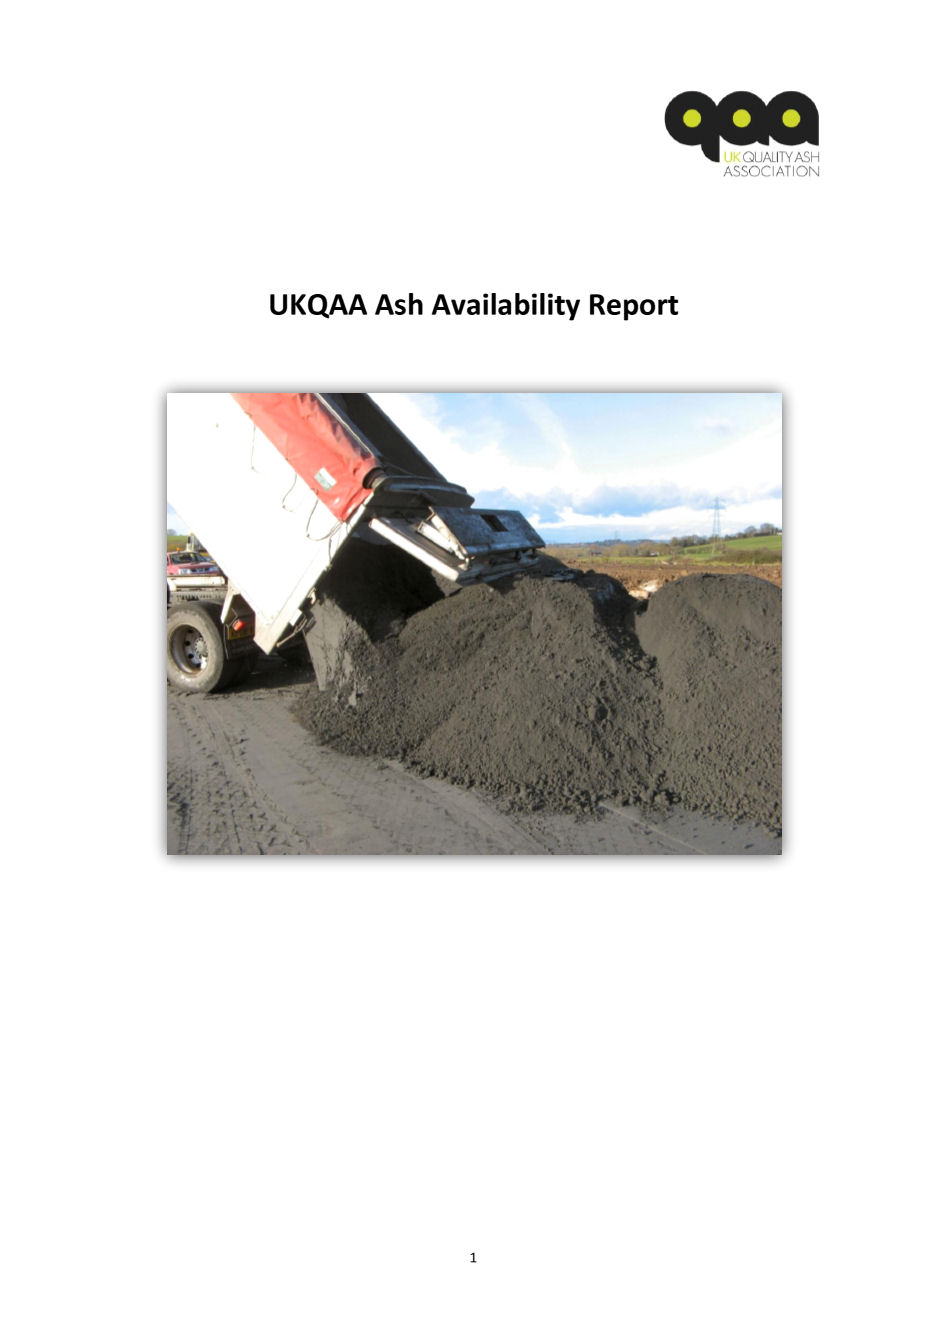 UKQAA Ash Availability Report